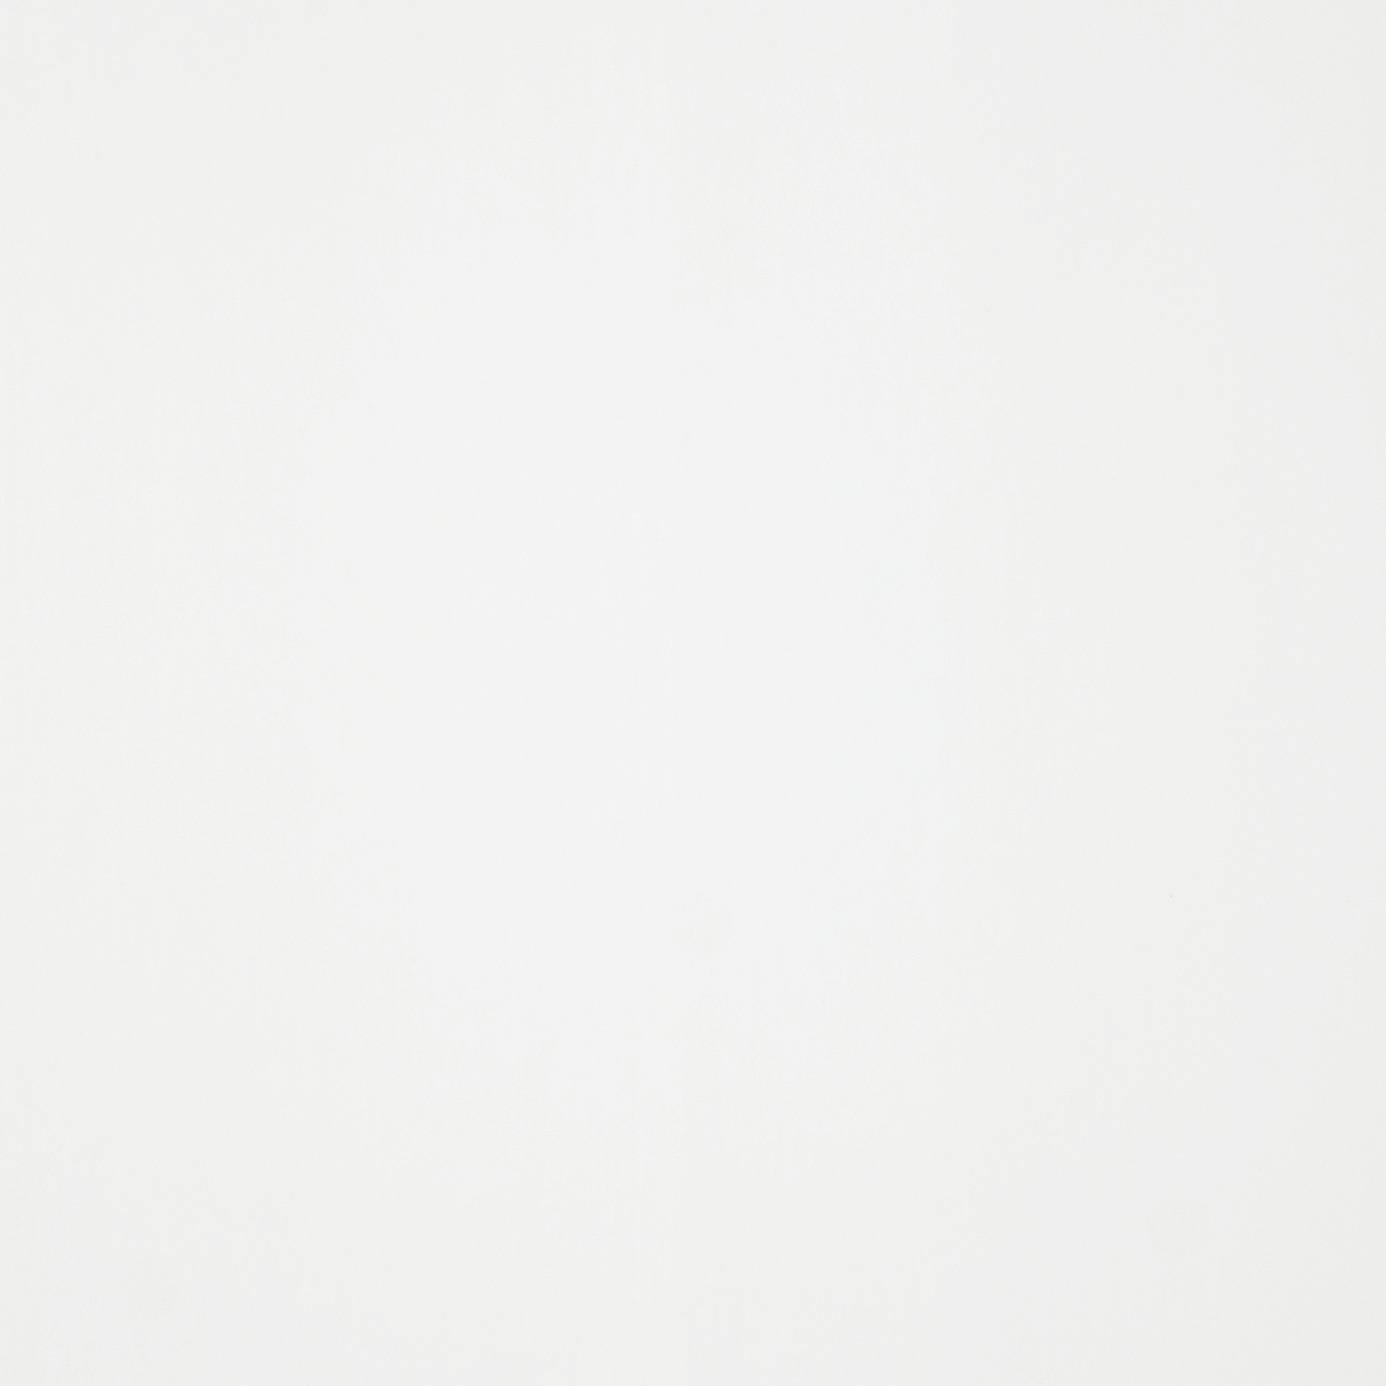 Французские обои Casadeco,  коллекция So White 2, артикулSWI63440022